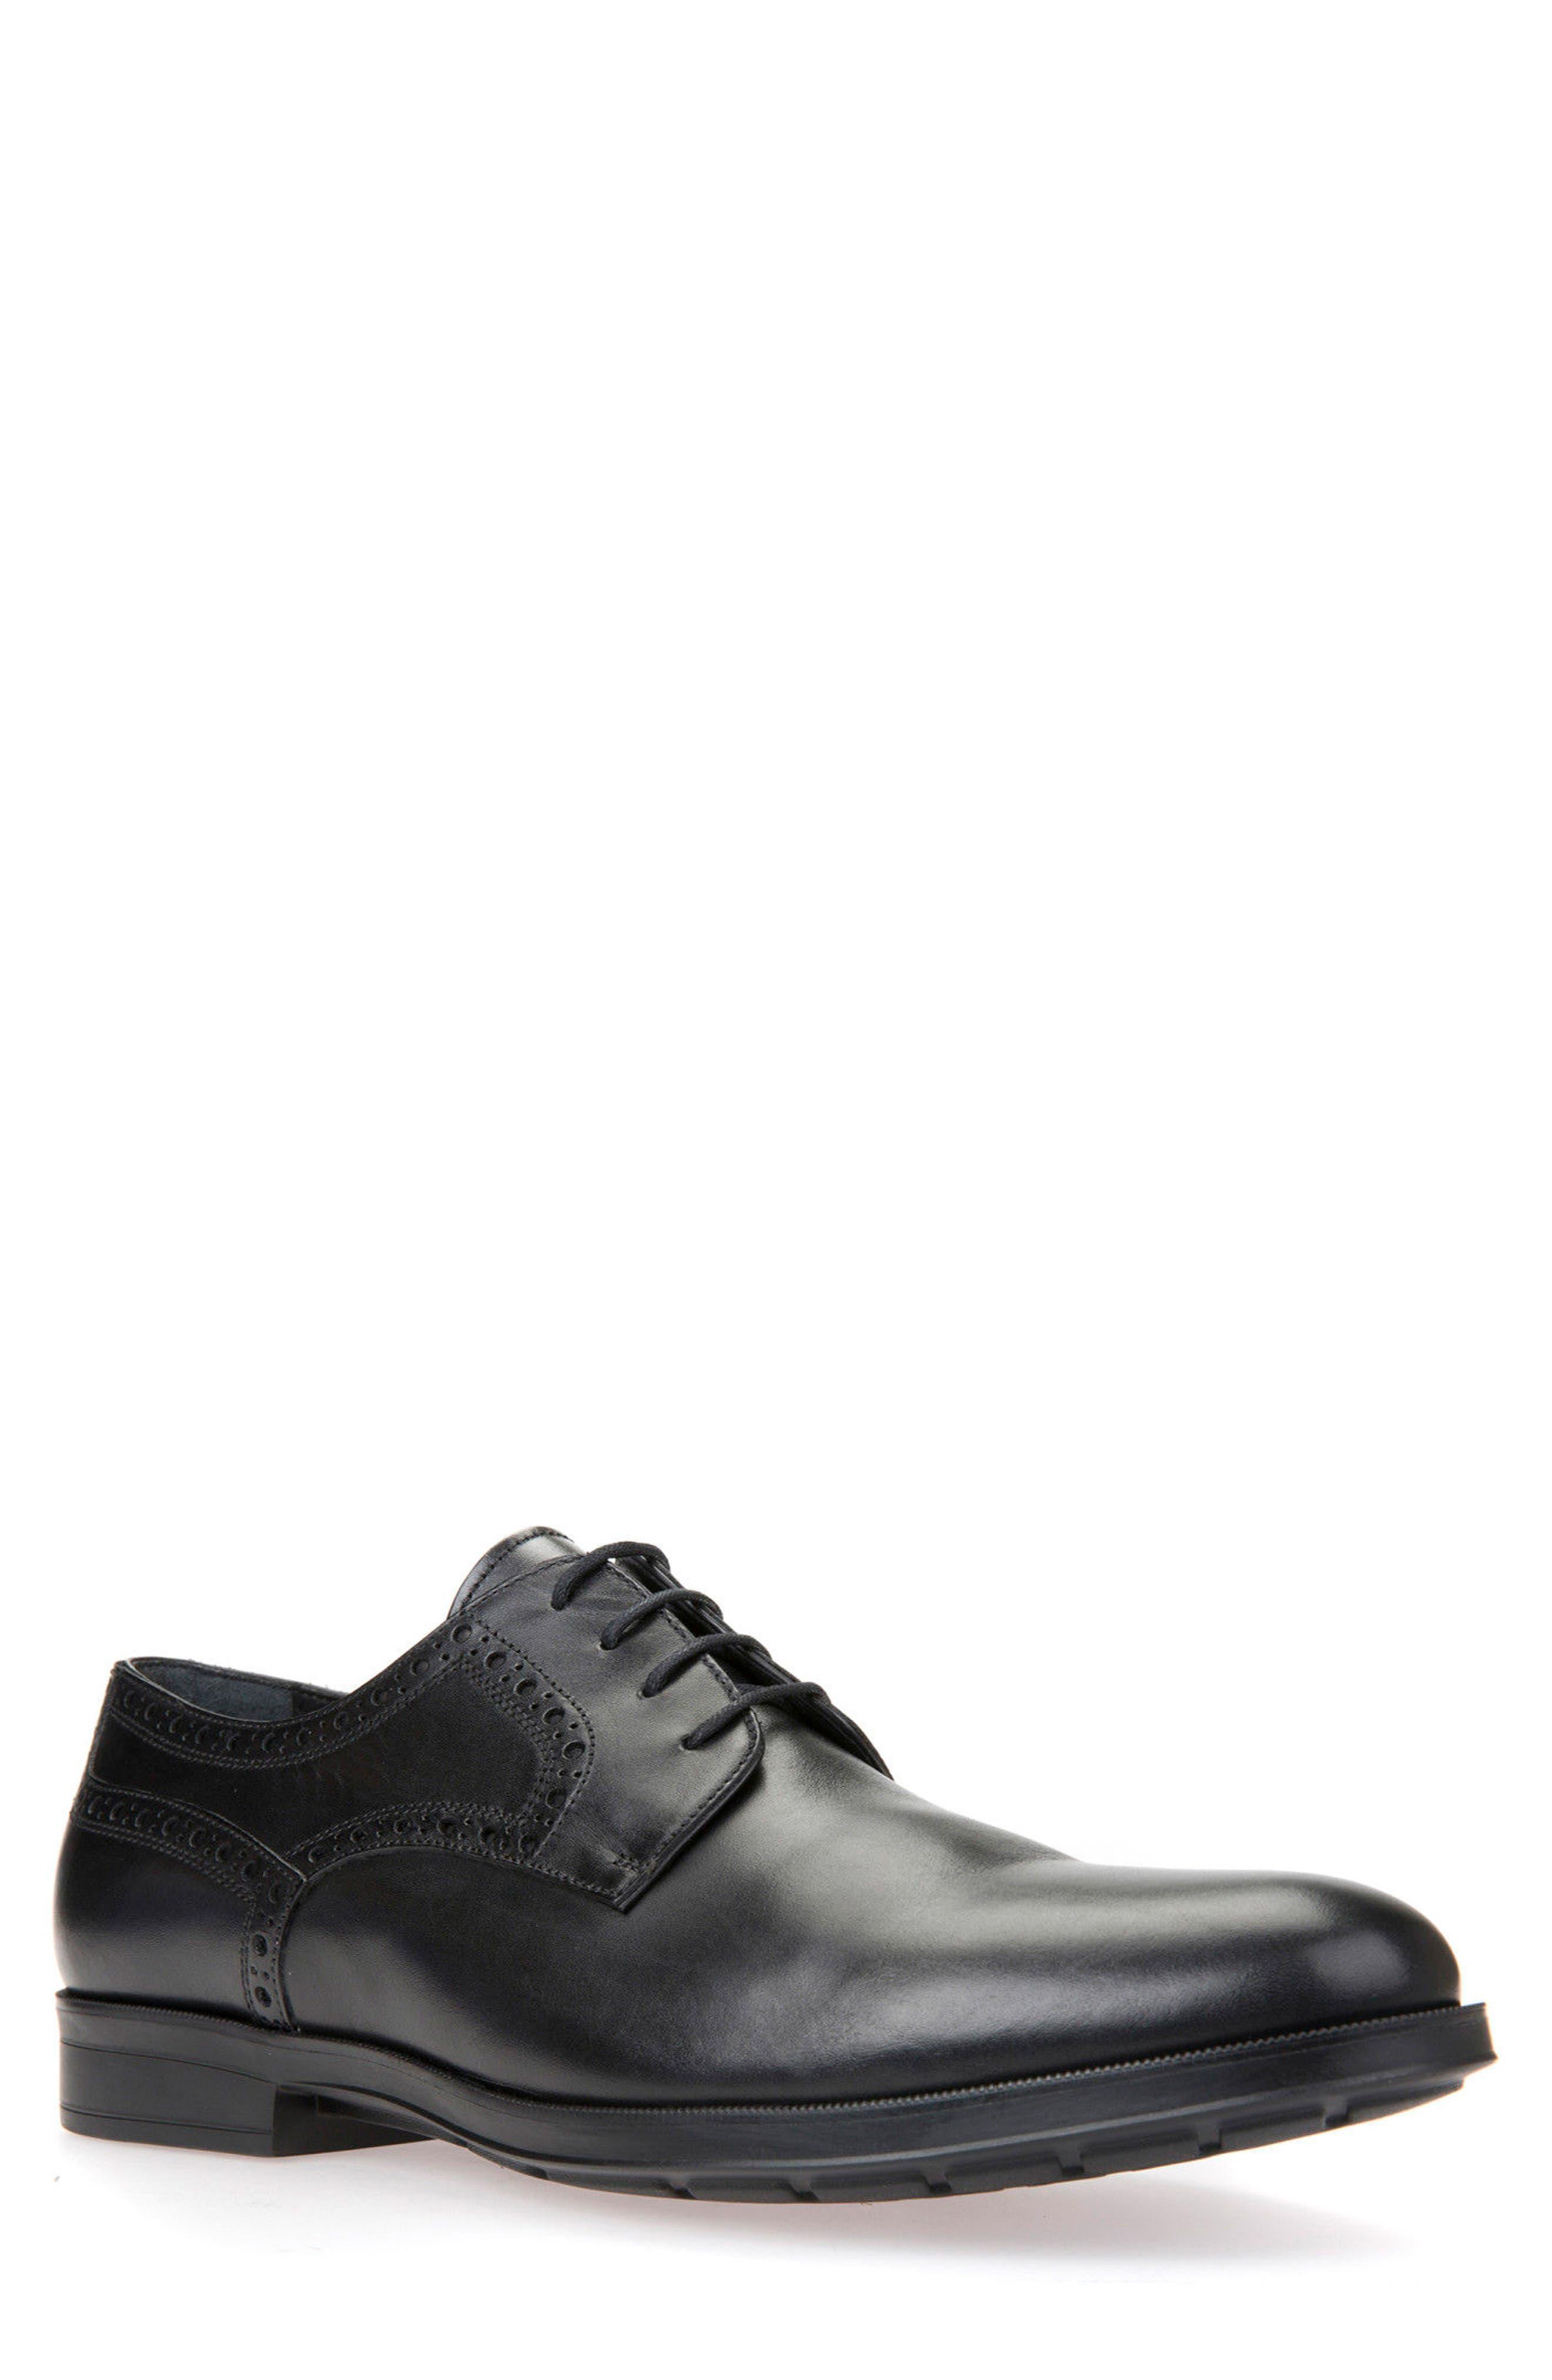 Main Image - Geox Hilstone 3 Plain Toe Derby (Men)